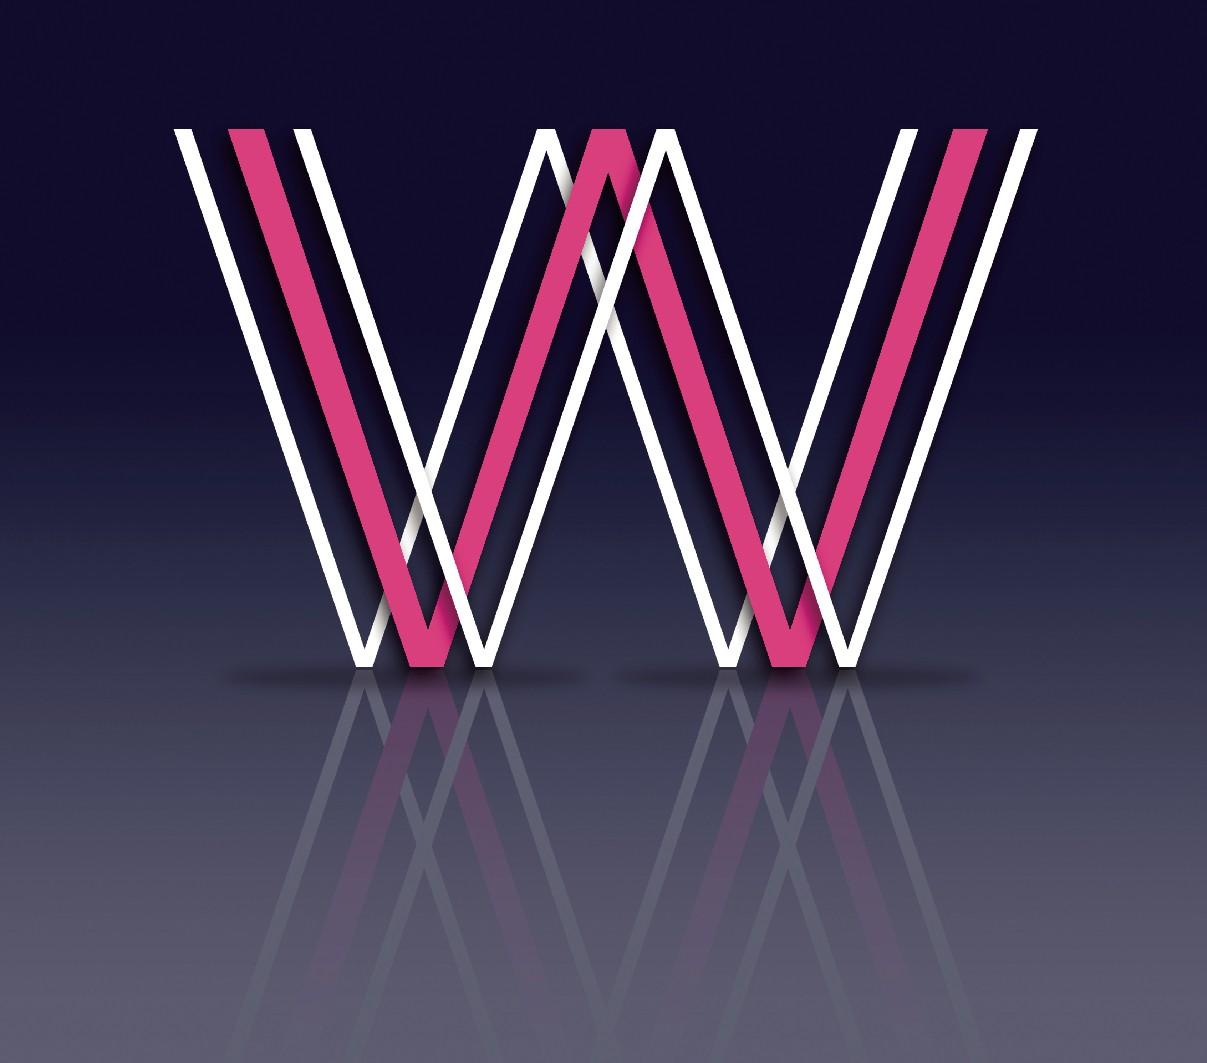 Logo design for Working Women's Wealth